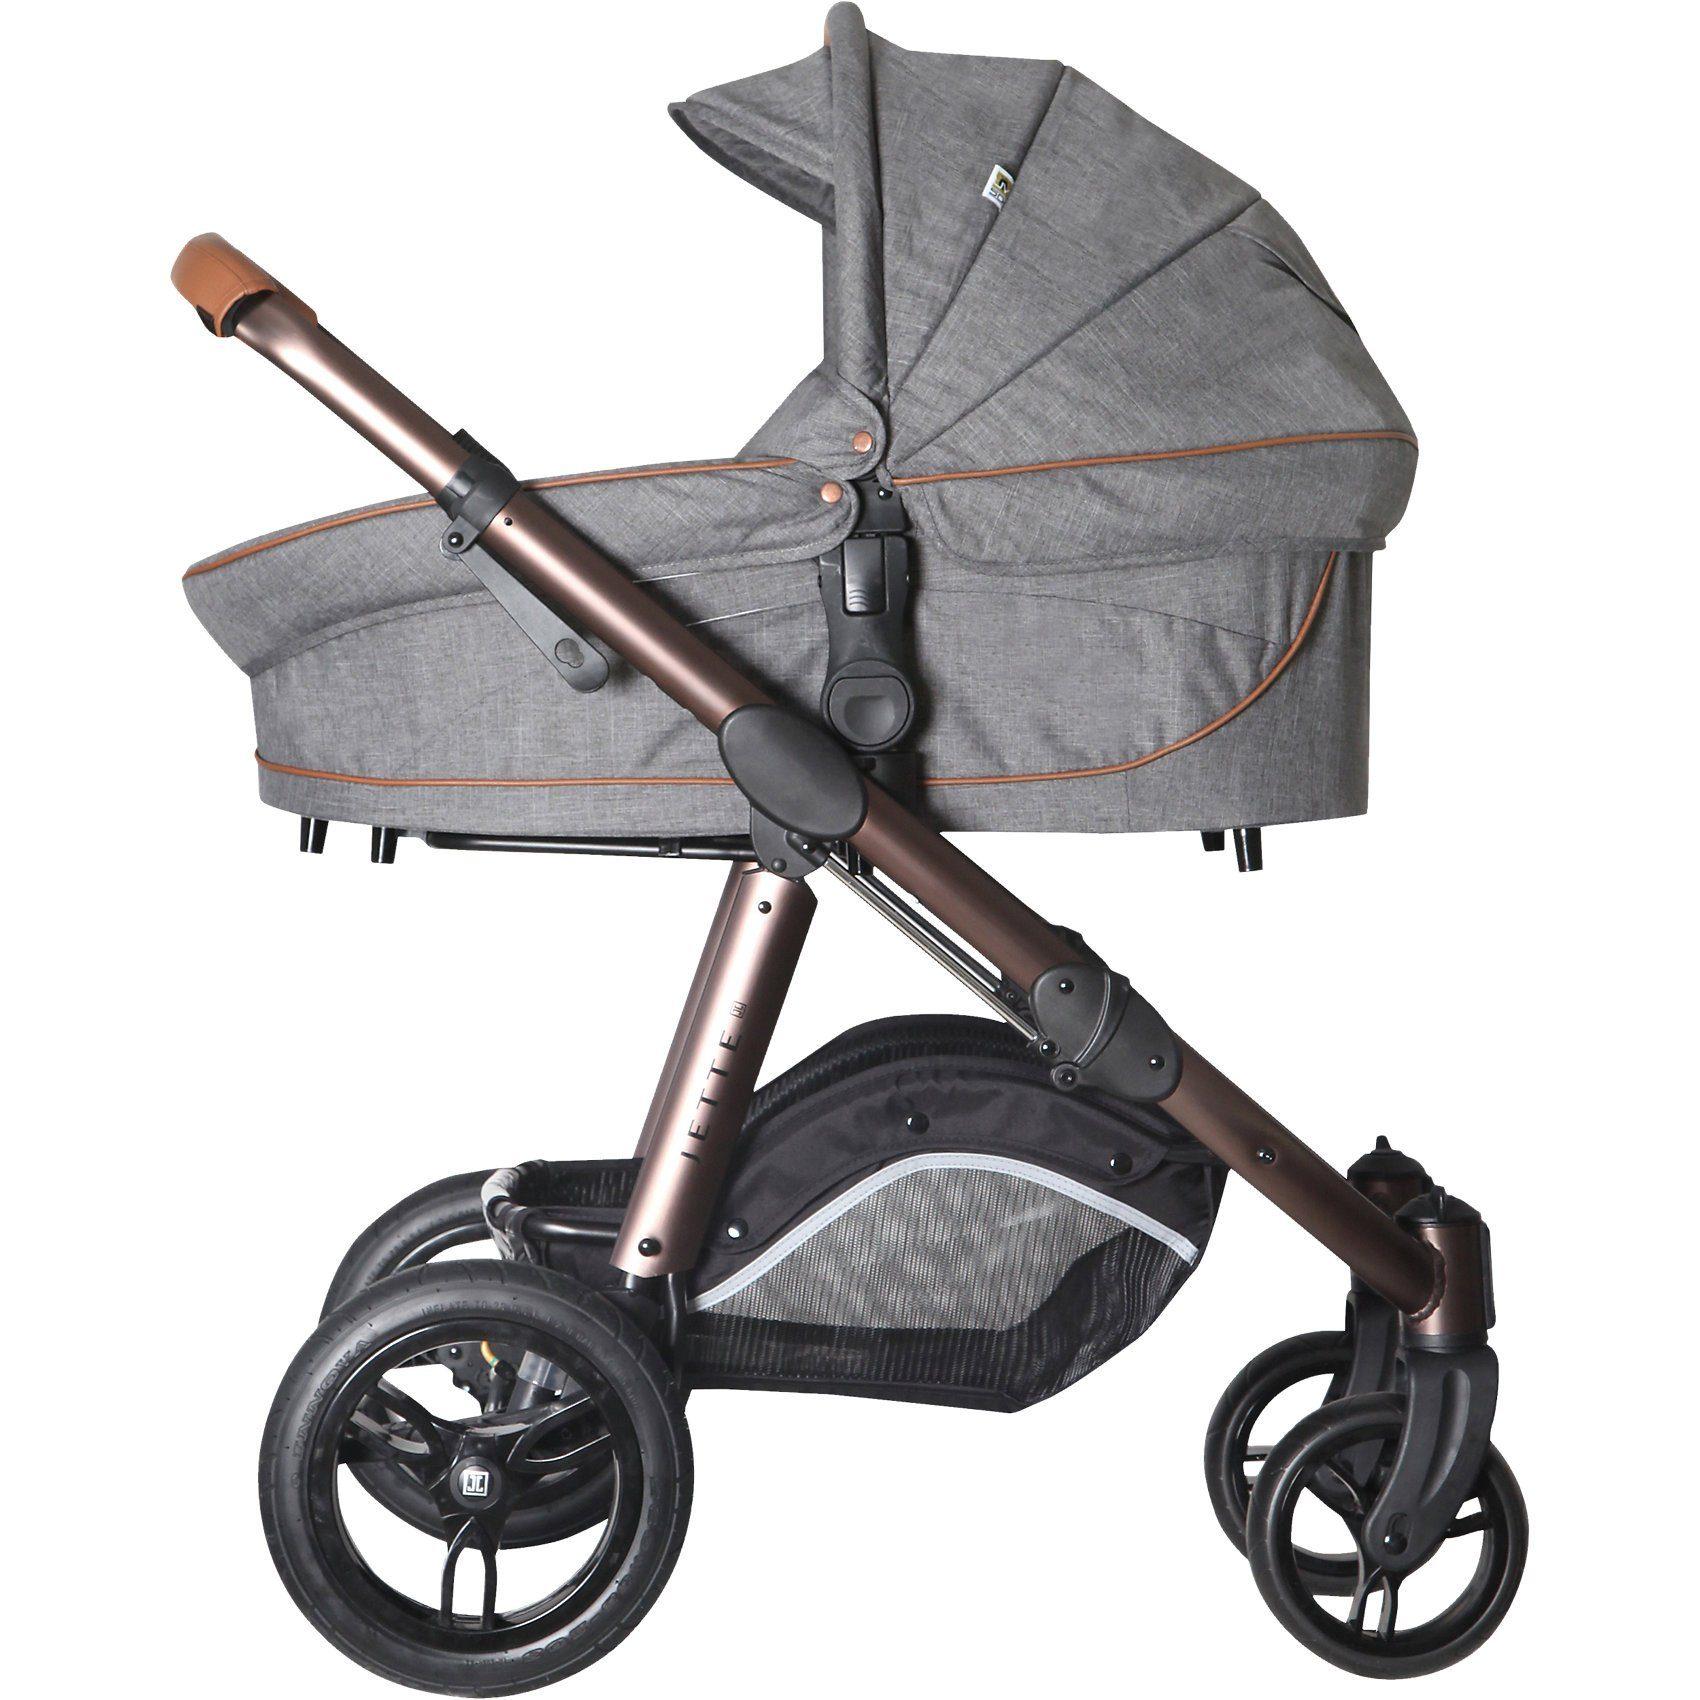 Jette Kinderwagen Kombi Kinderwagen JOEL AIR, grey flanell